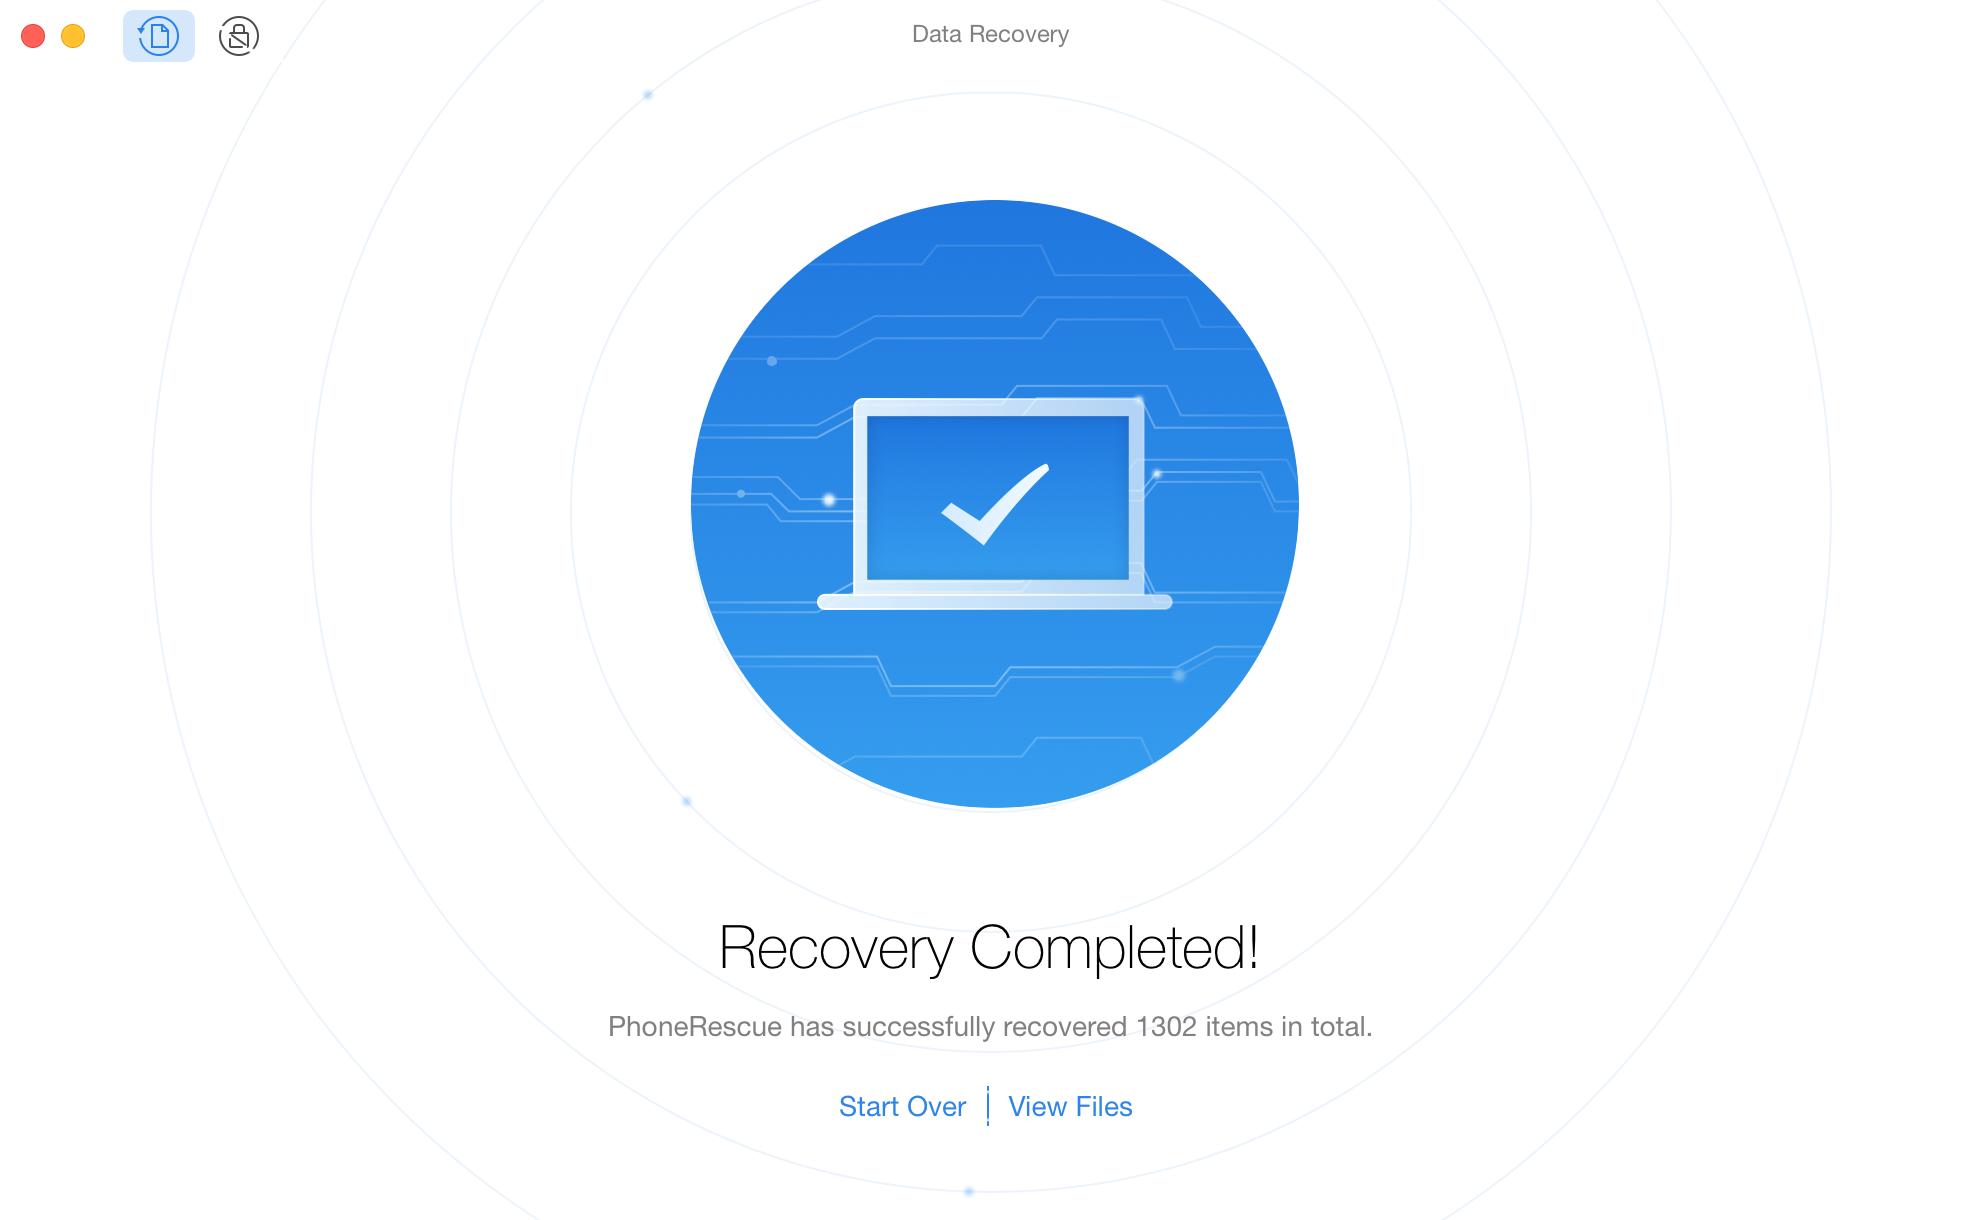 Finishing Recovery Process